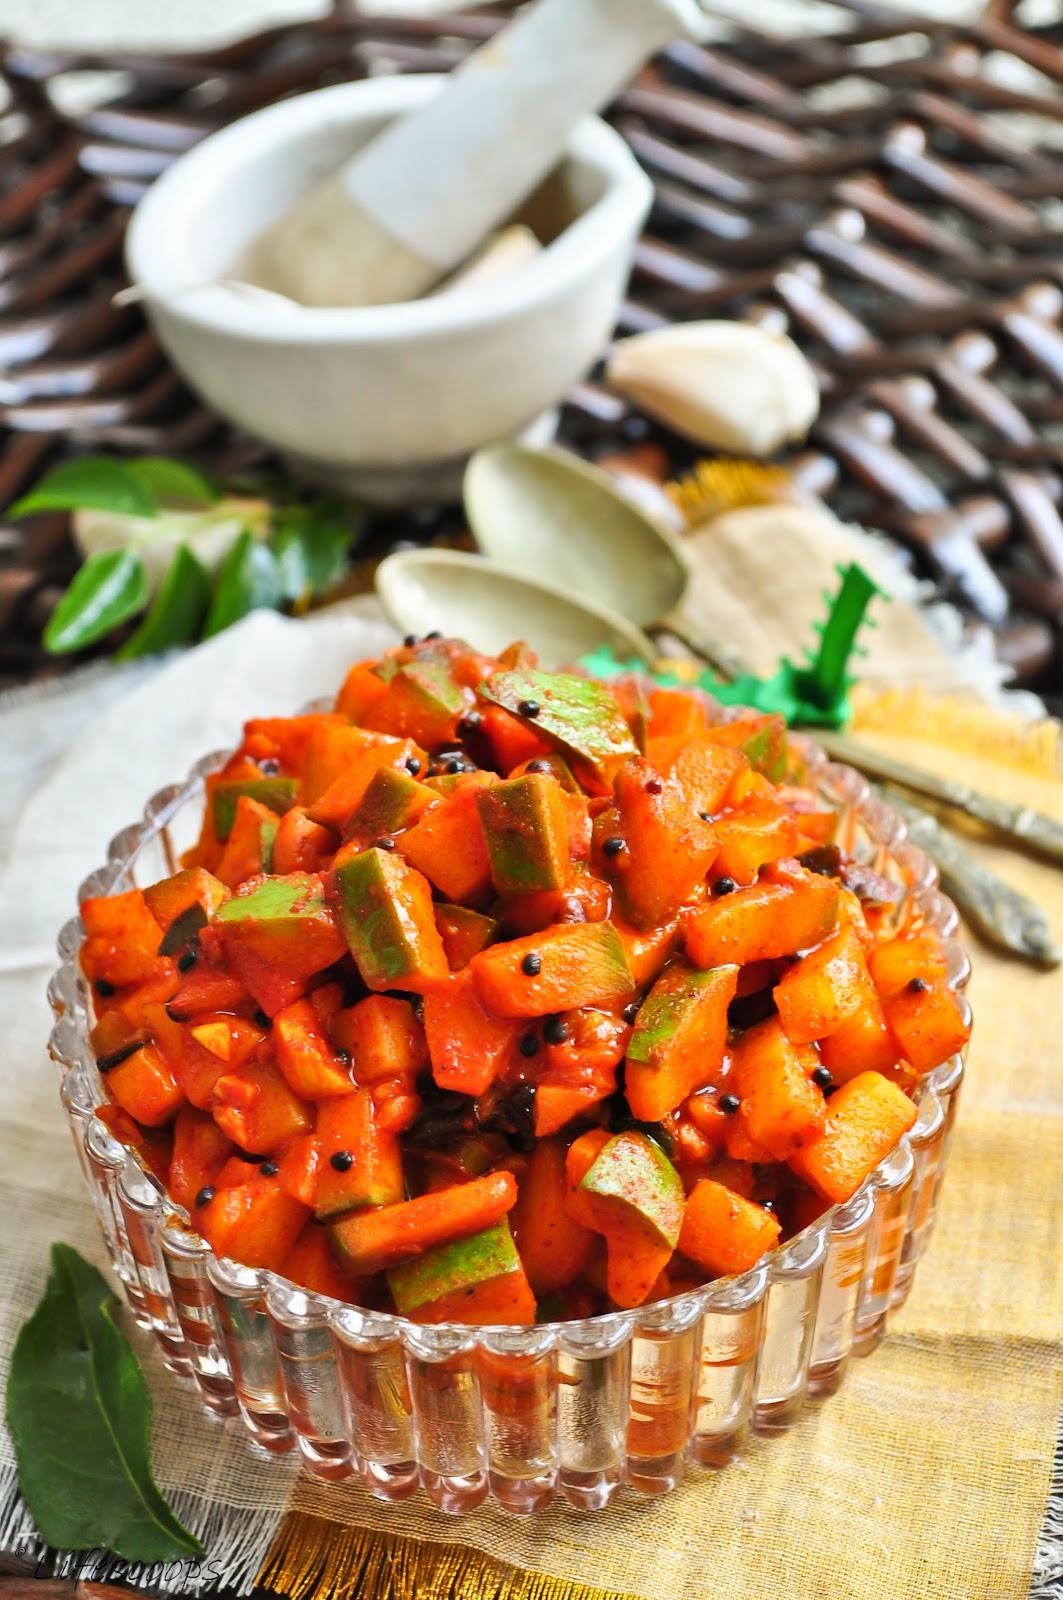 Life Scoops Kadumanga Achar Spicy Kerala Mango Pickle